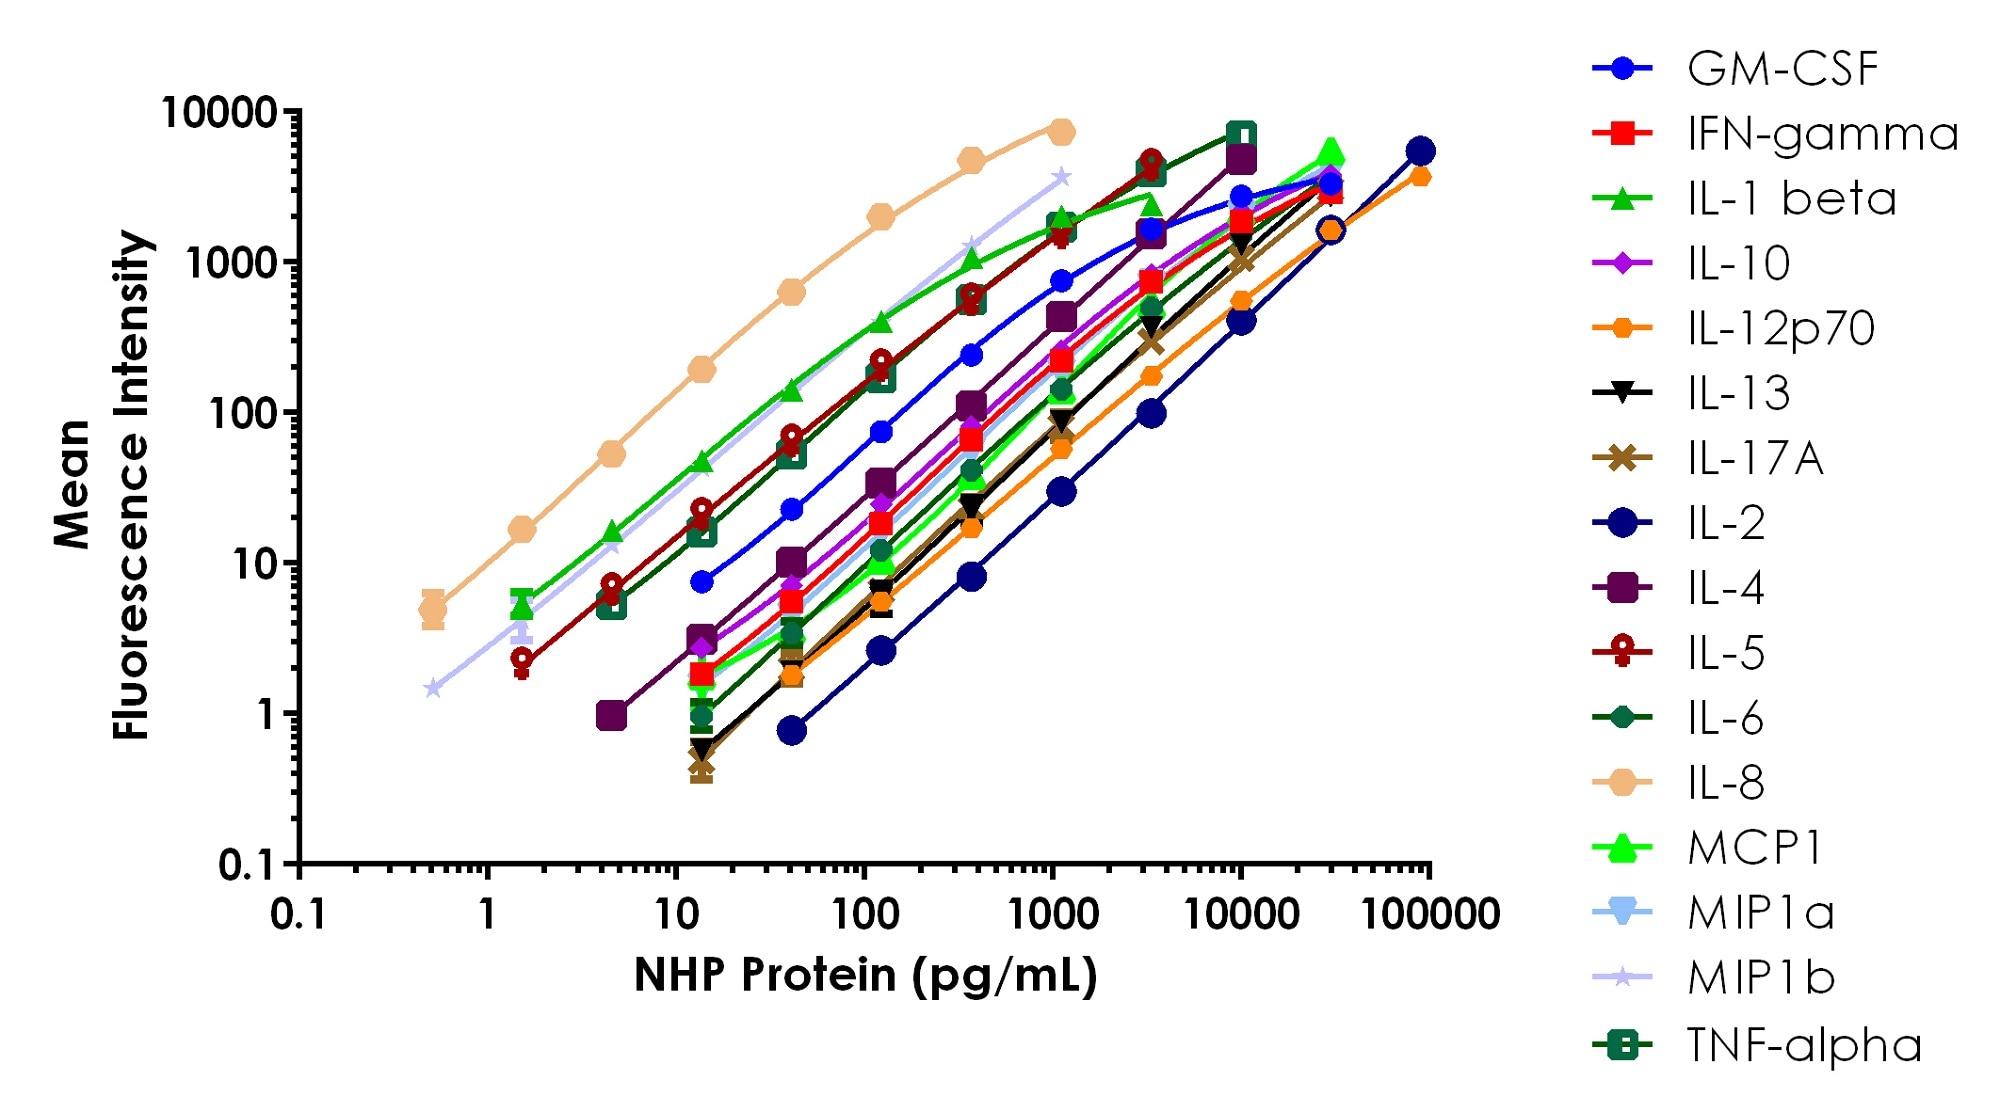 Example of NHP Key Cytokines (16-plex) standard curves